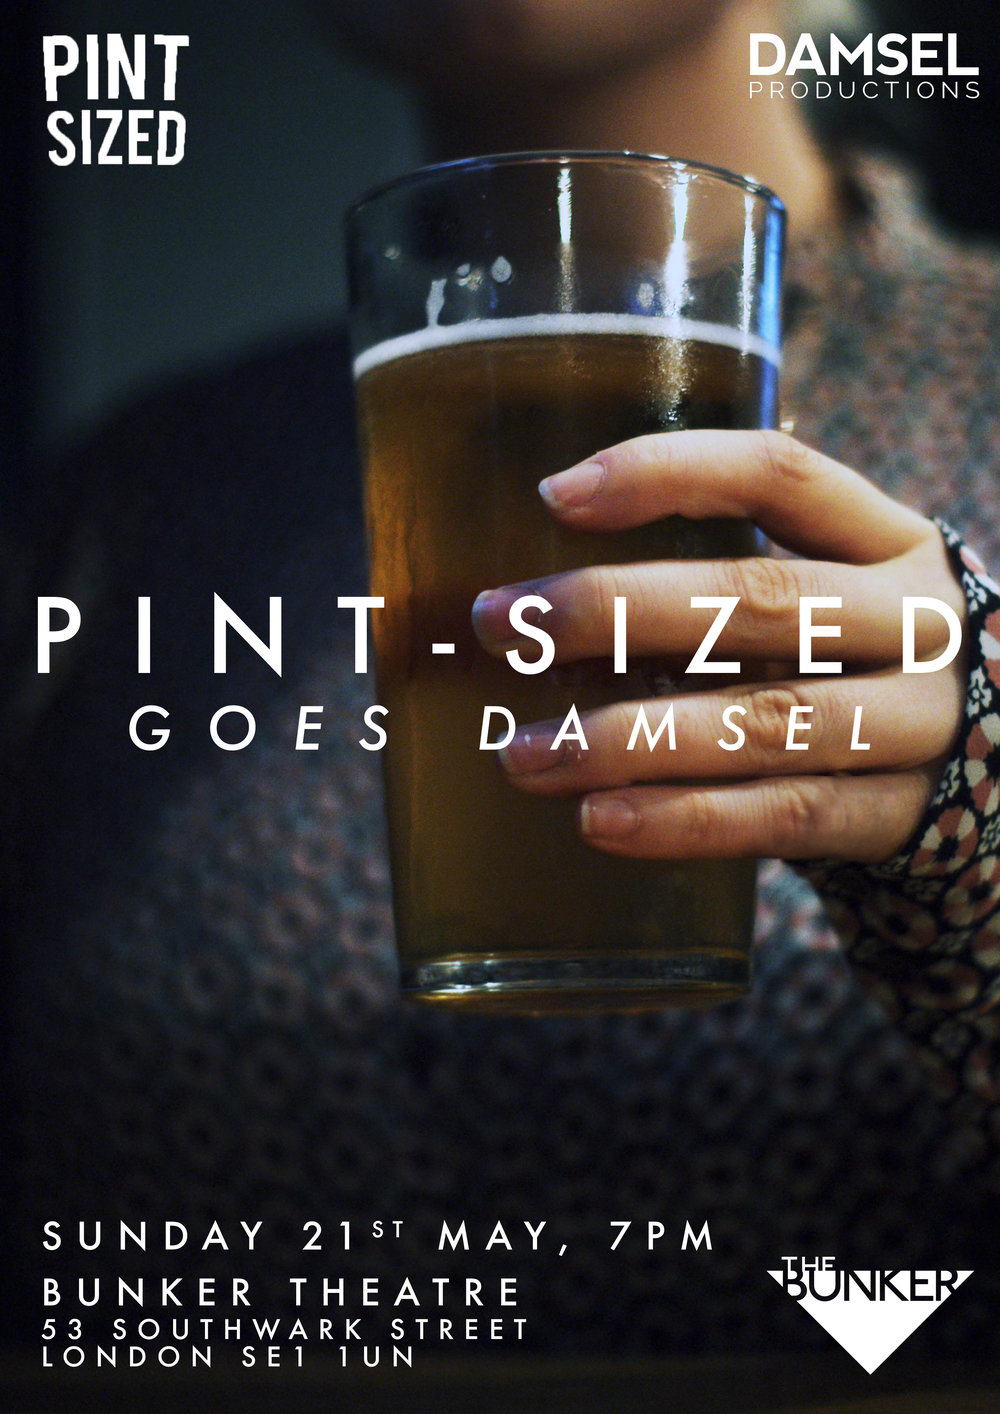 PINT-SIZED